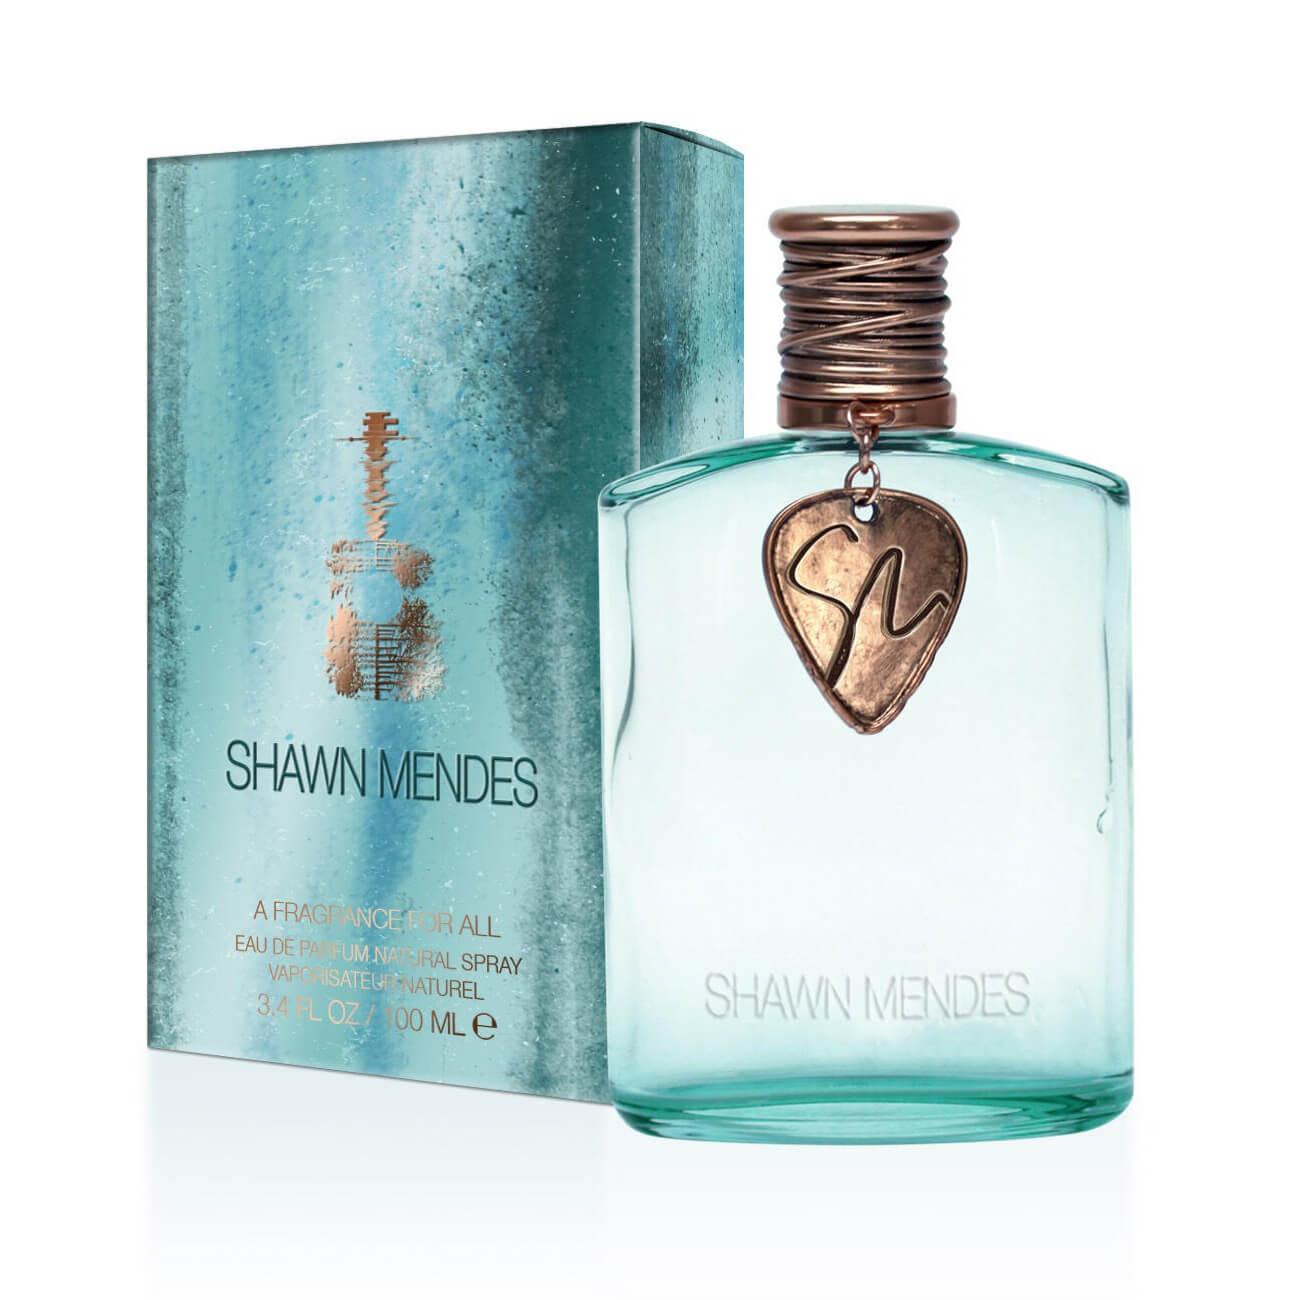 shawn mendes perfume parfum signature